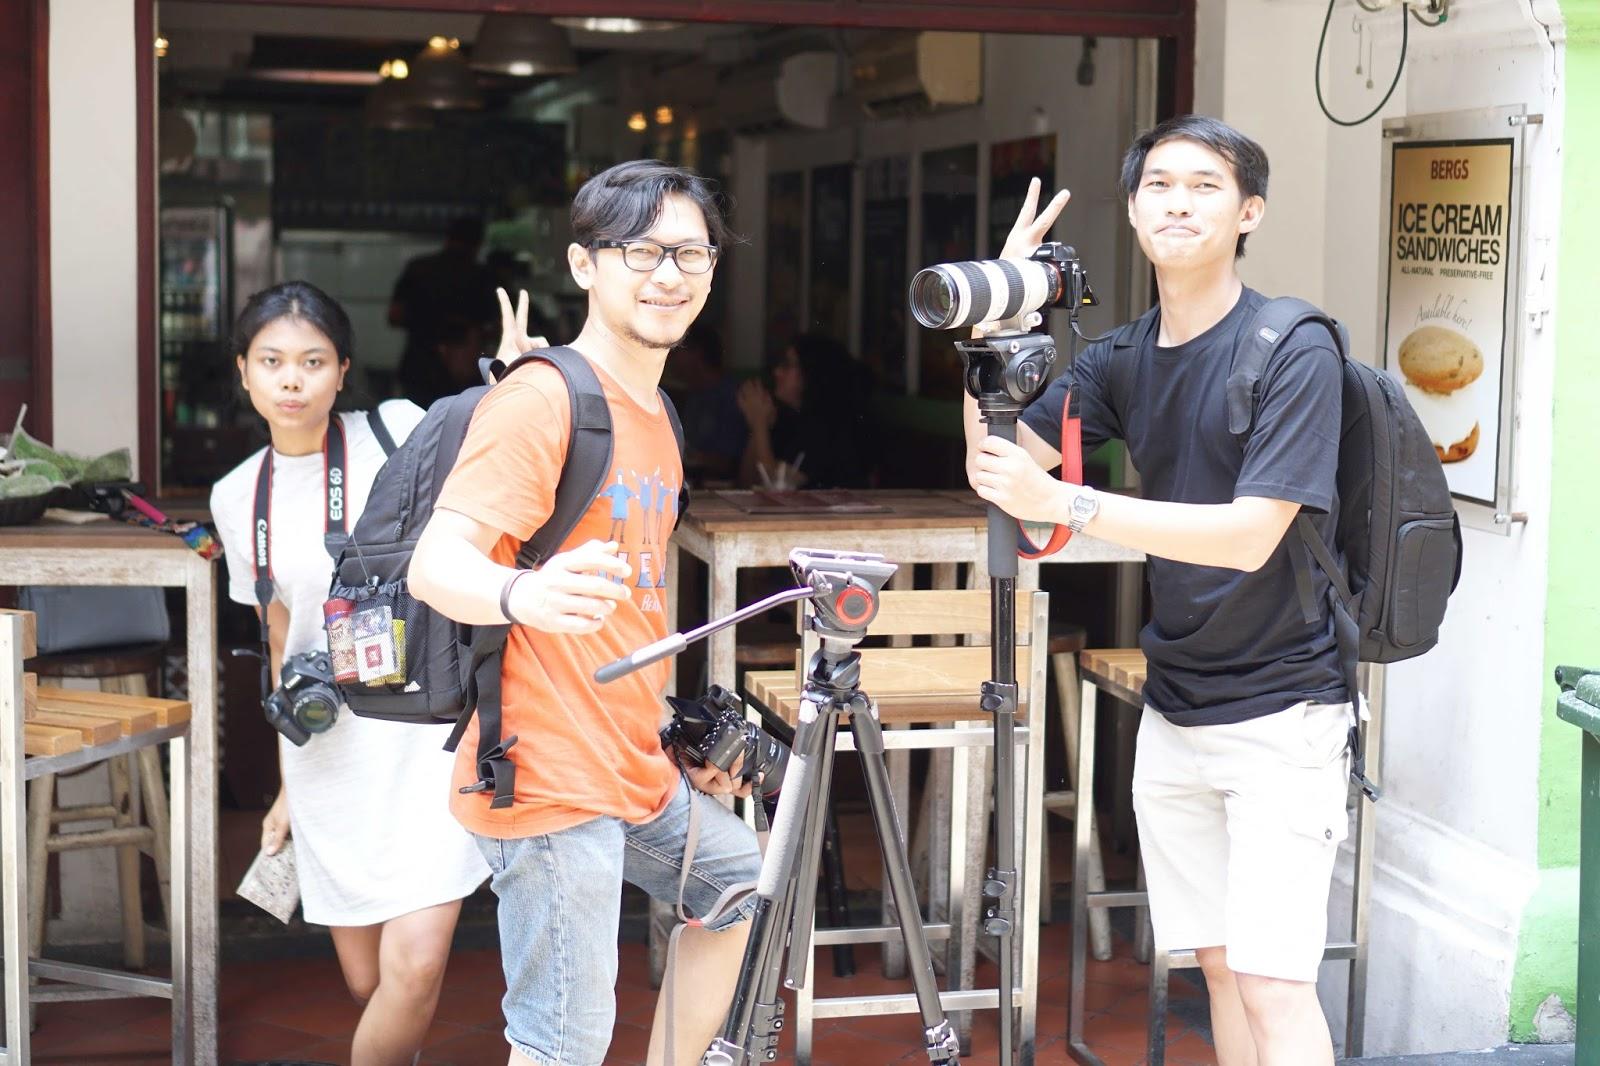 travel, singapore, haji lane, travel to singapore, travel with jean milka, haji lane, haji lane singapore, style, fashion, ootd, fashion blogger, blogger, travel